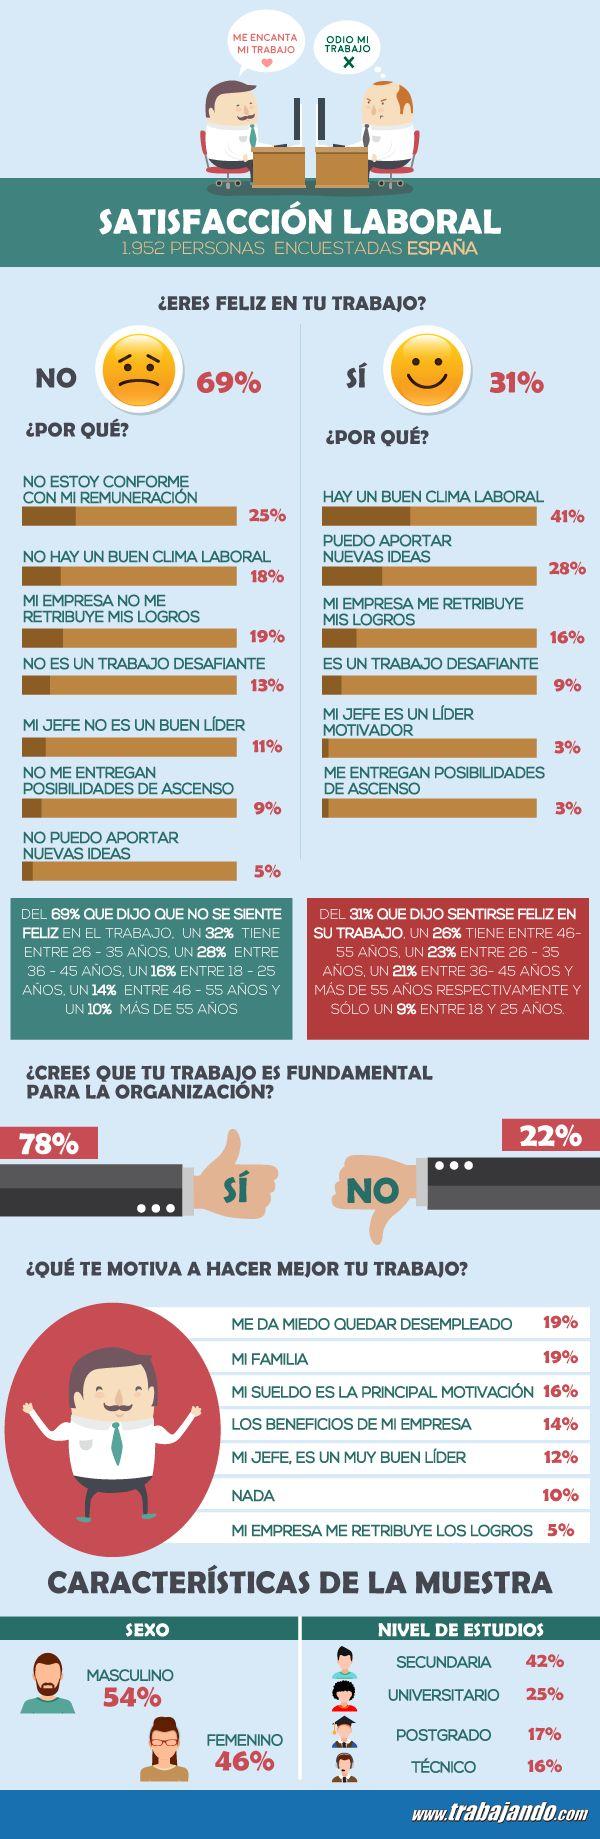 Infografia-satisfaccion-laboral-españa